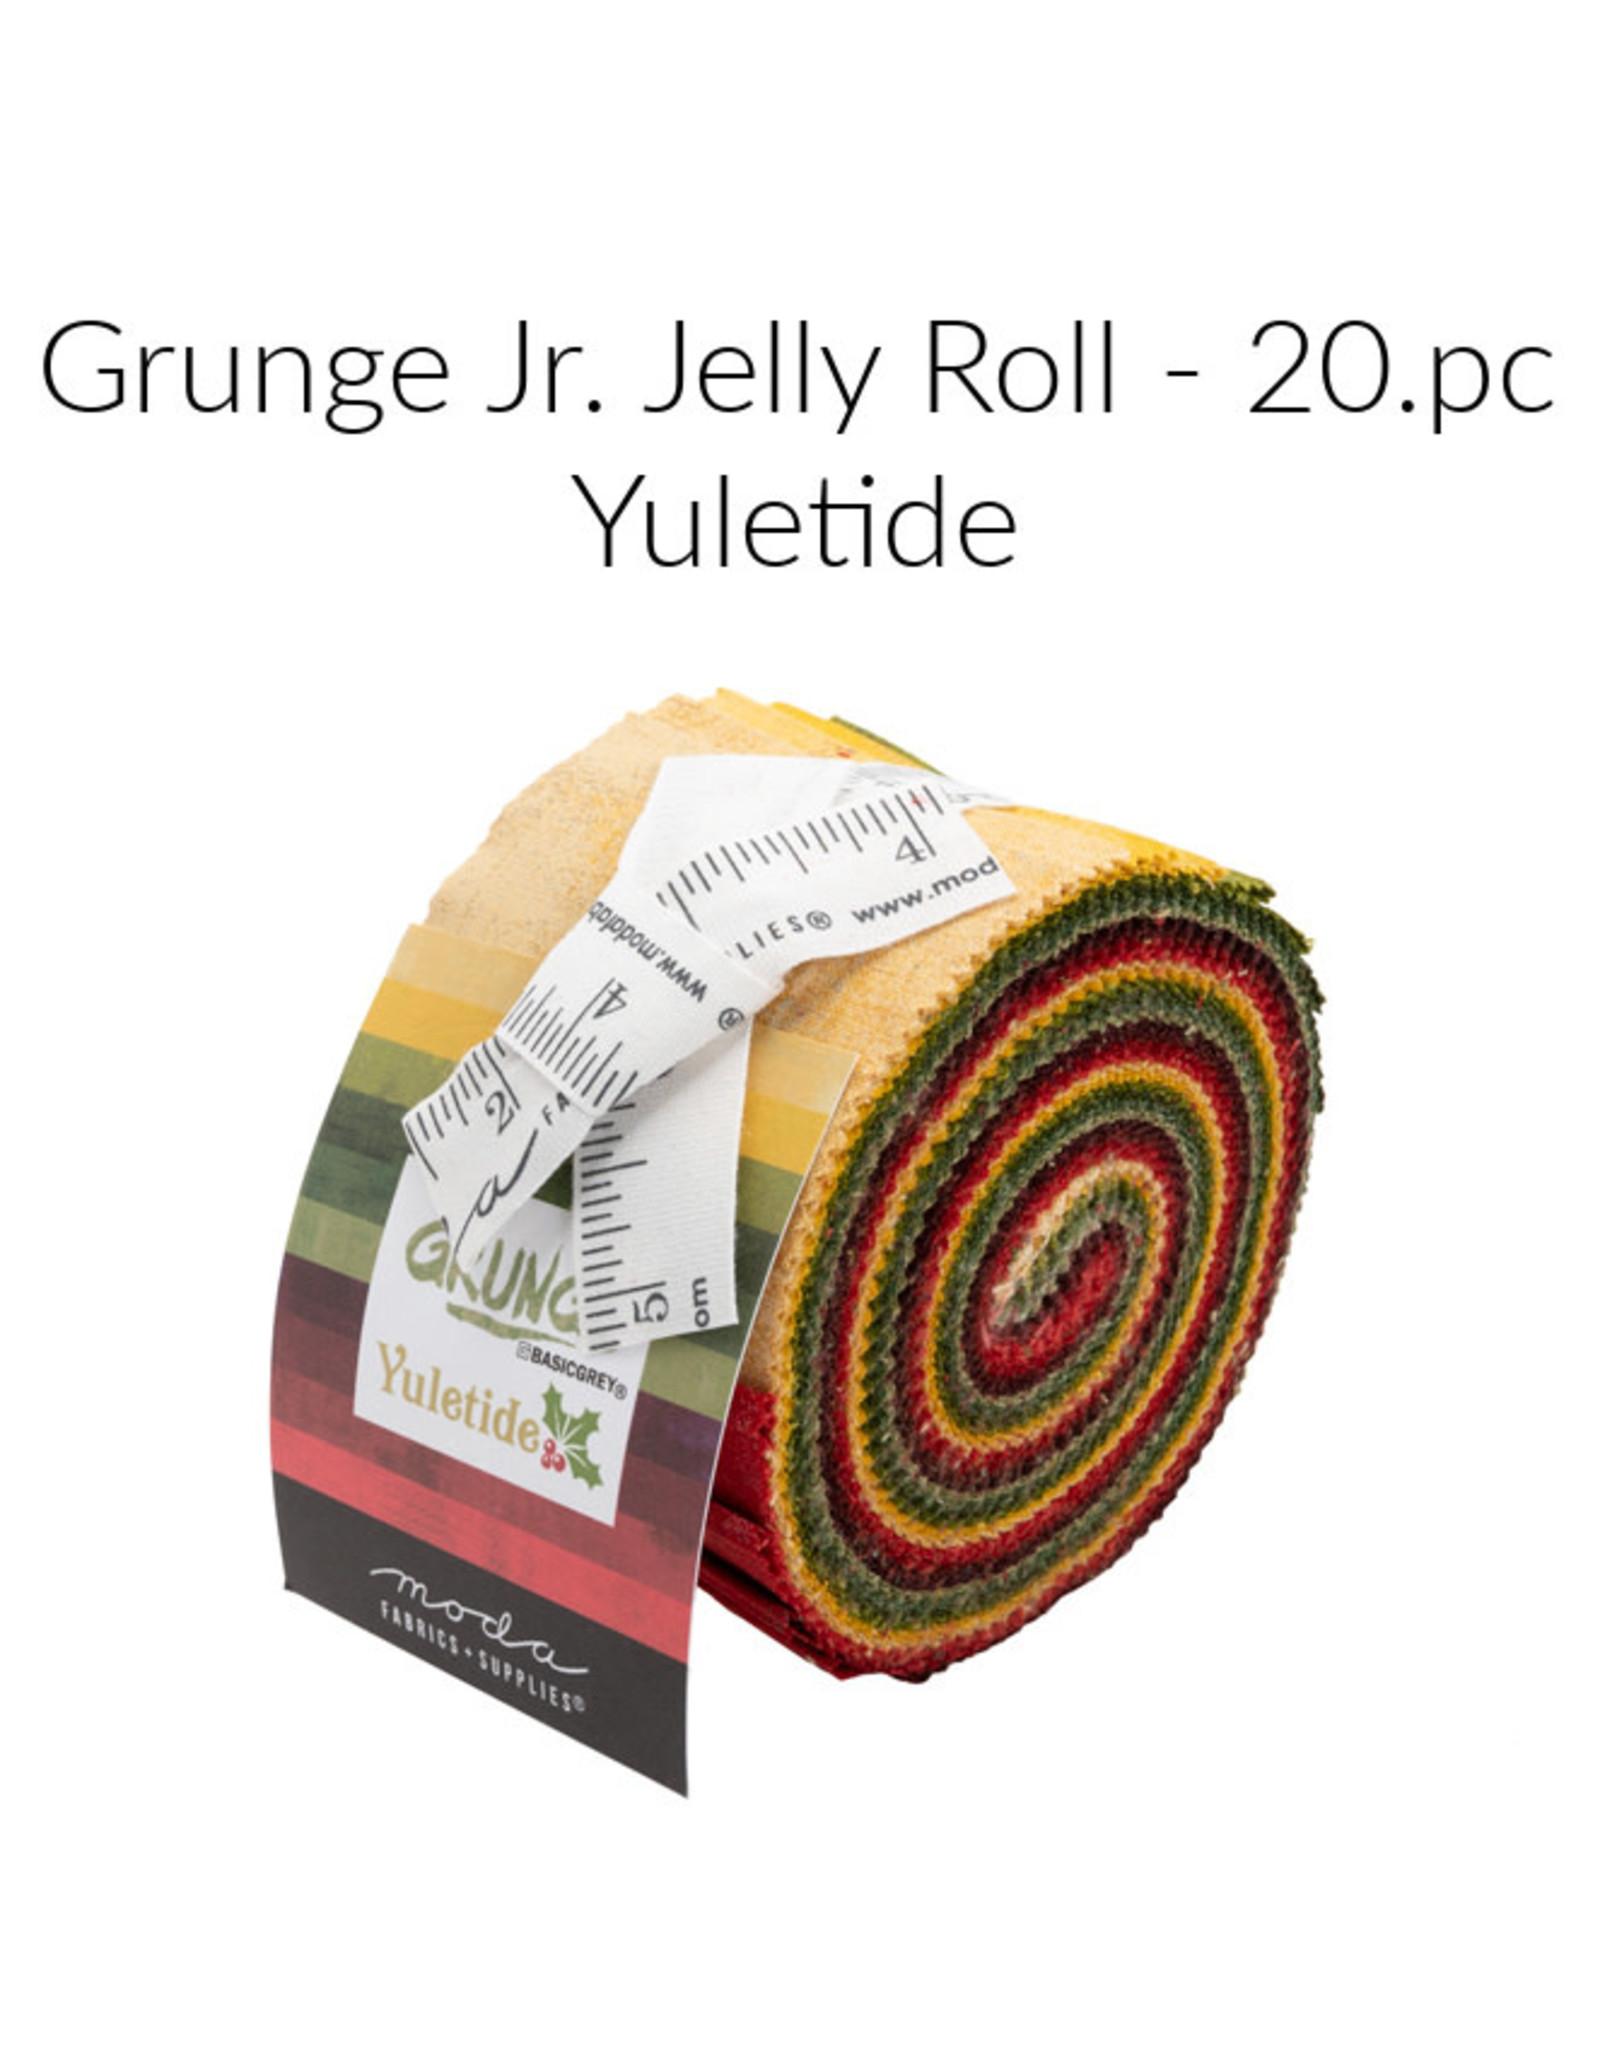 Moda Grunge Yuletide, Jelly Roll, 20 pcs.